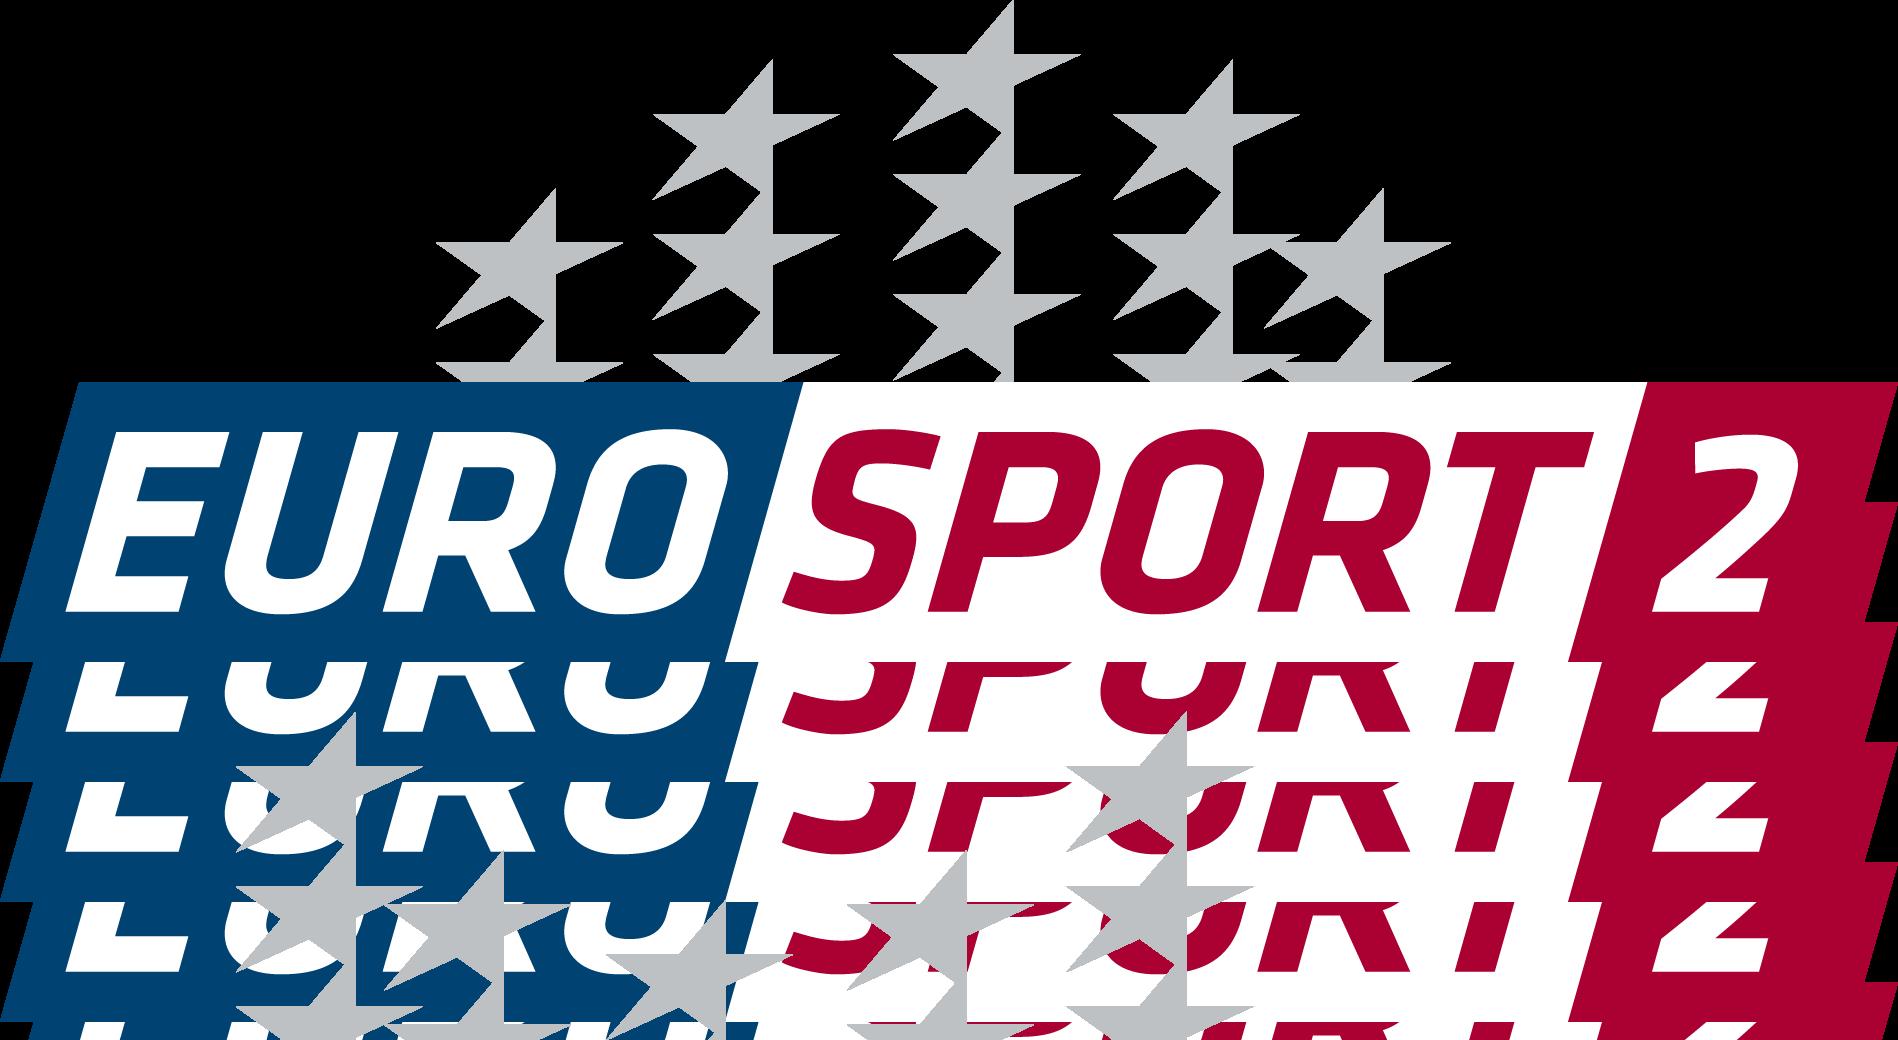 EUROSPORT2 Logo (2011)  (c) Eurosport2